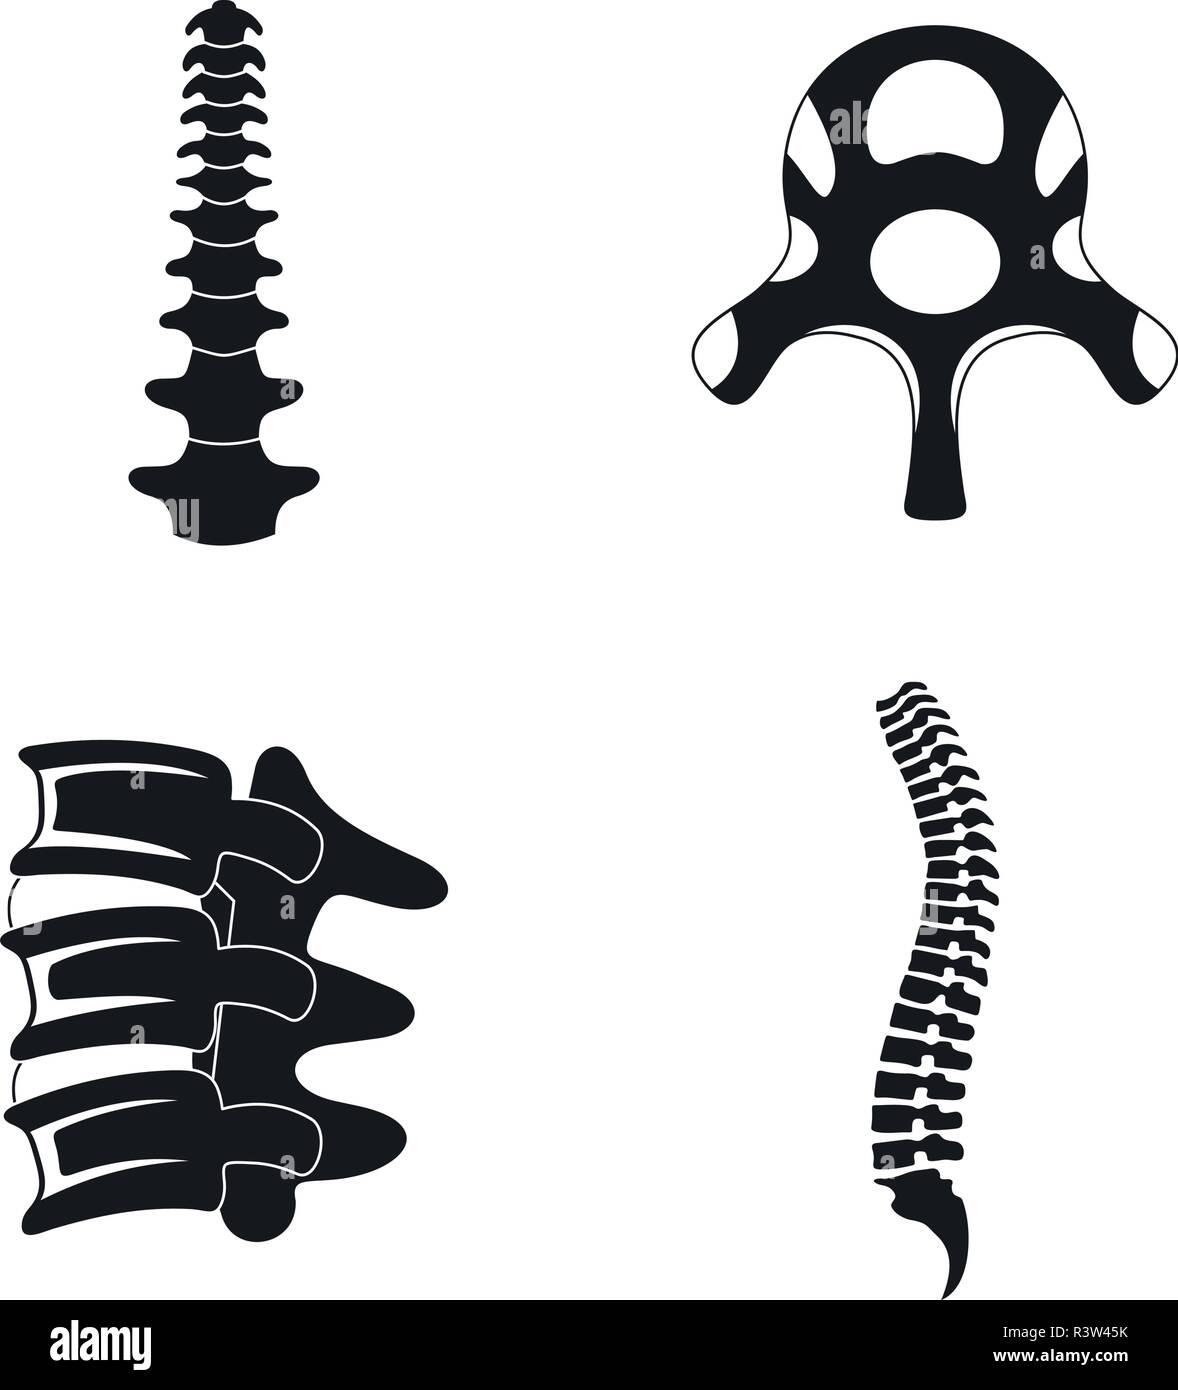 Spine orthopedic vertebra icons set. Simple illustration of 4 spine orthopedic vertebra vector icons for web - Stock Image